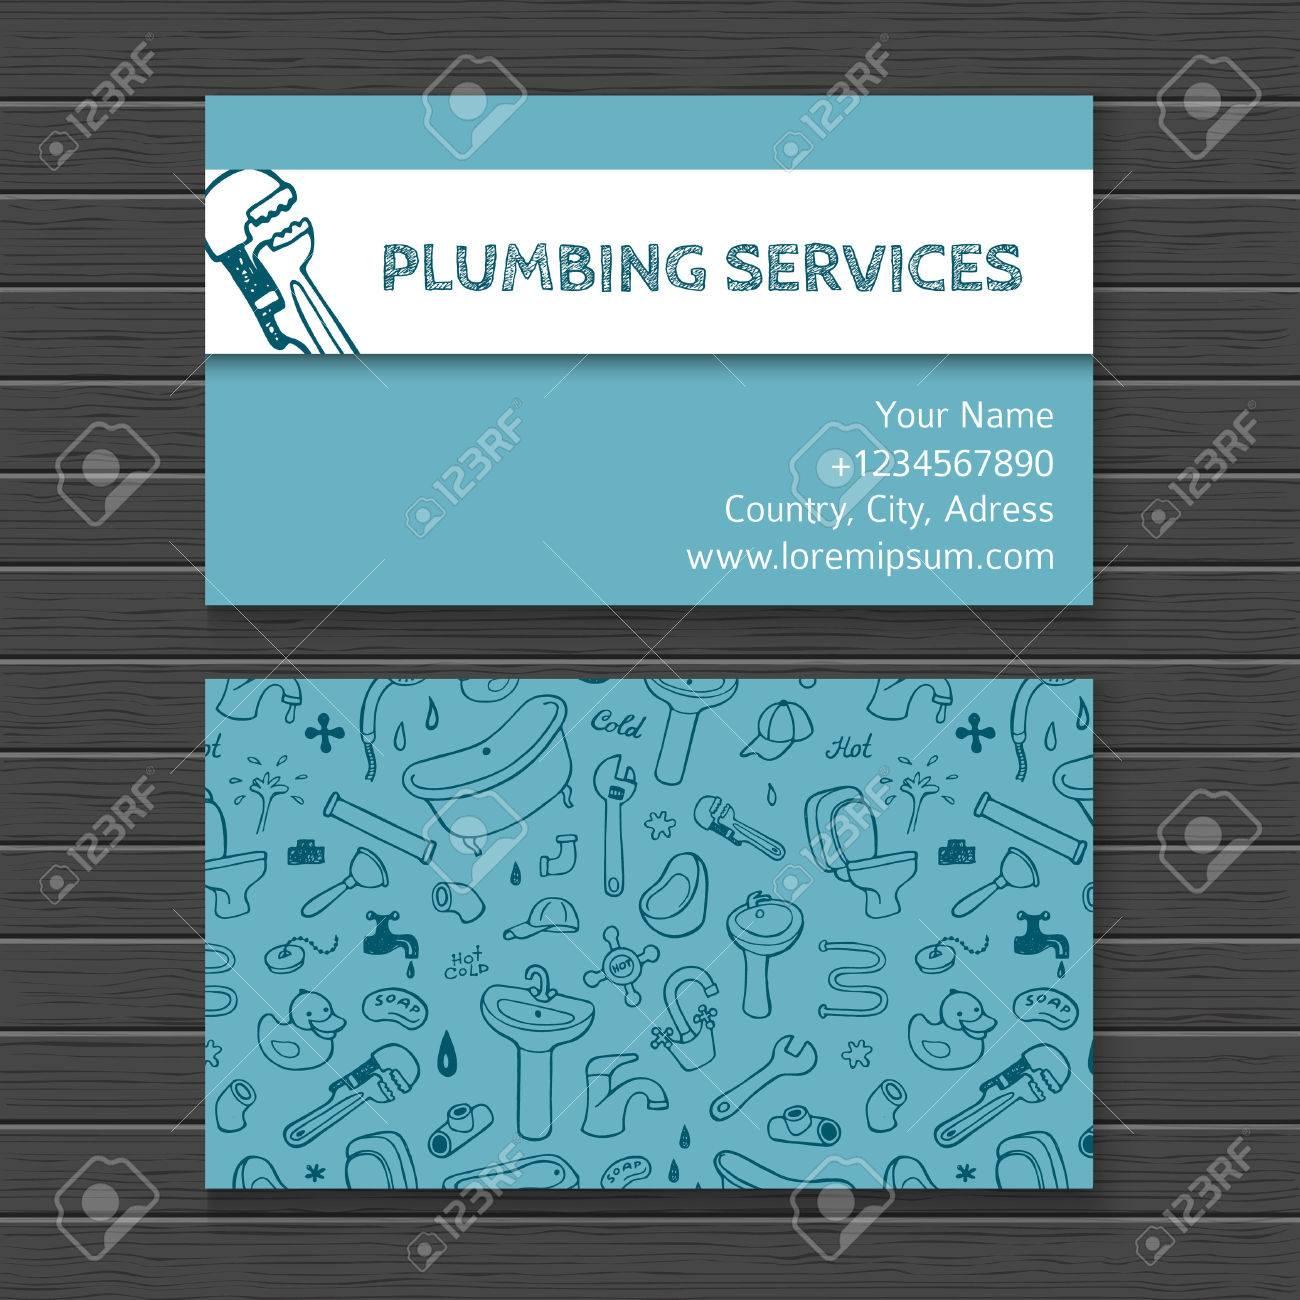 Hand drawn watercolor business card mock up with plumbing doodle hand drawn watercolor business card mock up with plumbing doodle icons stock vector 41722841 colourmoves